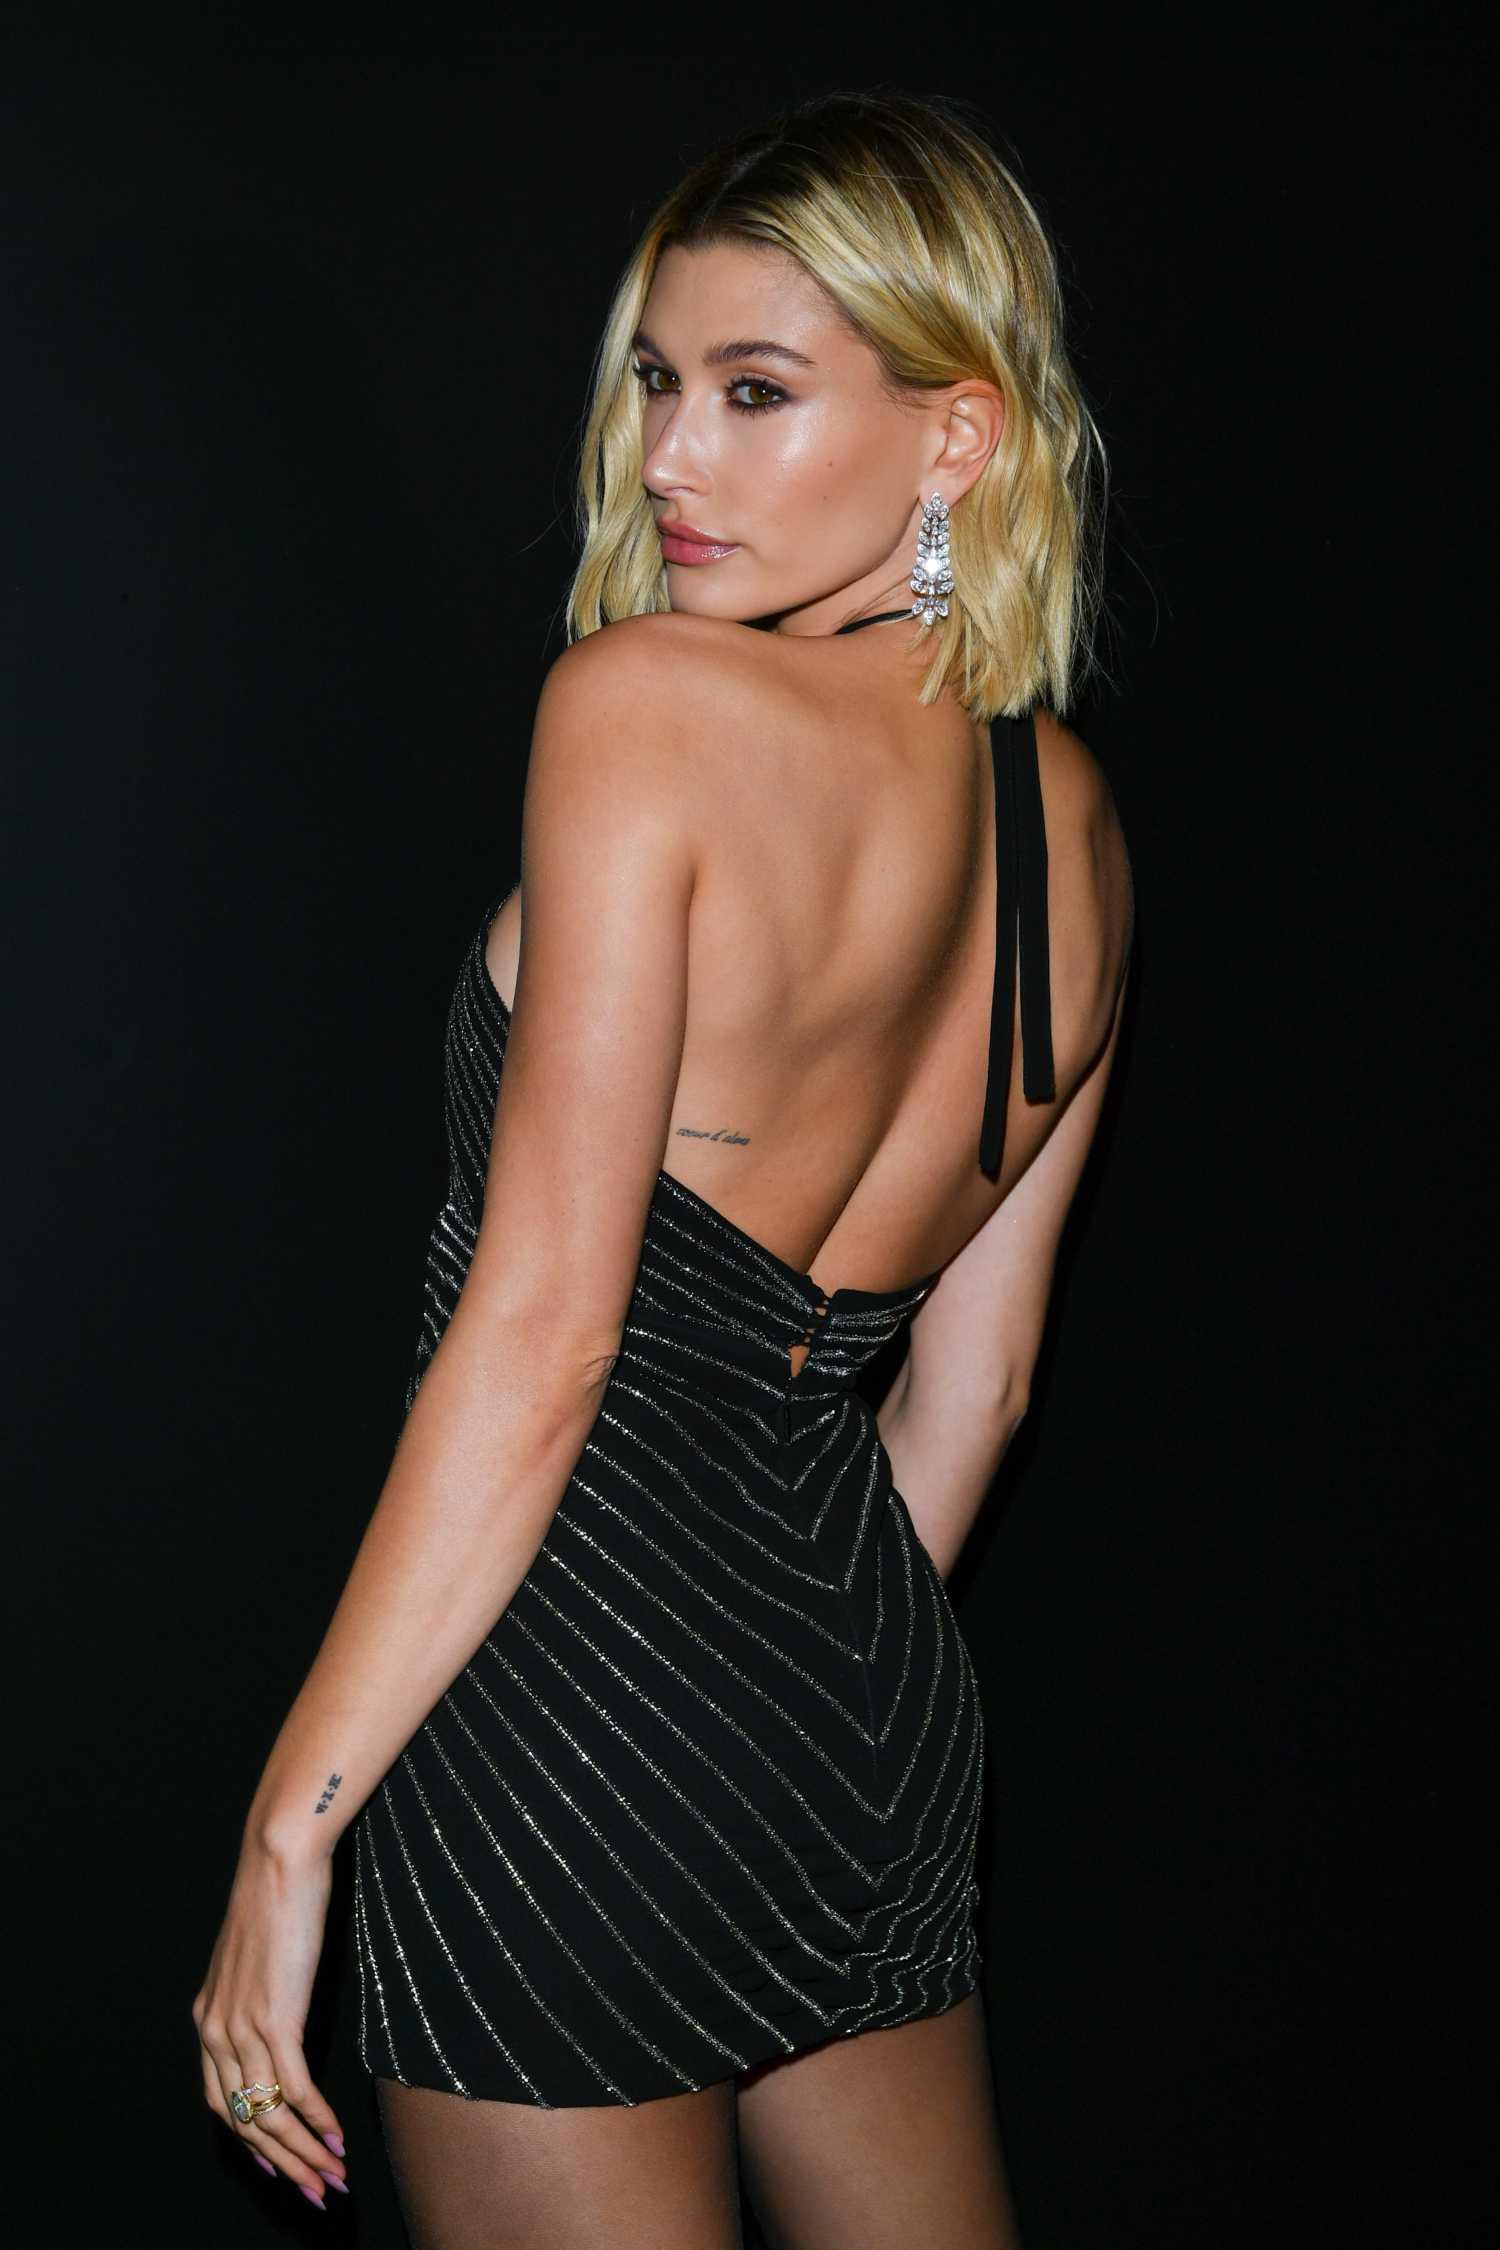 Hailey Bieber Attends 2020 Saint Laurent Fashion Show in